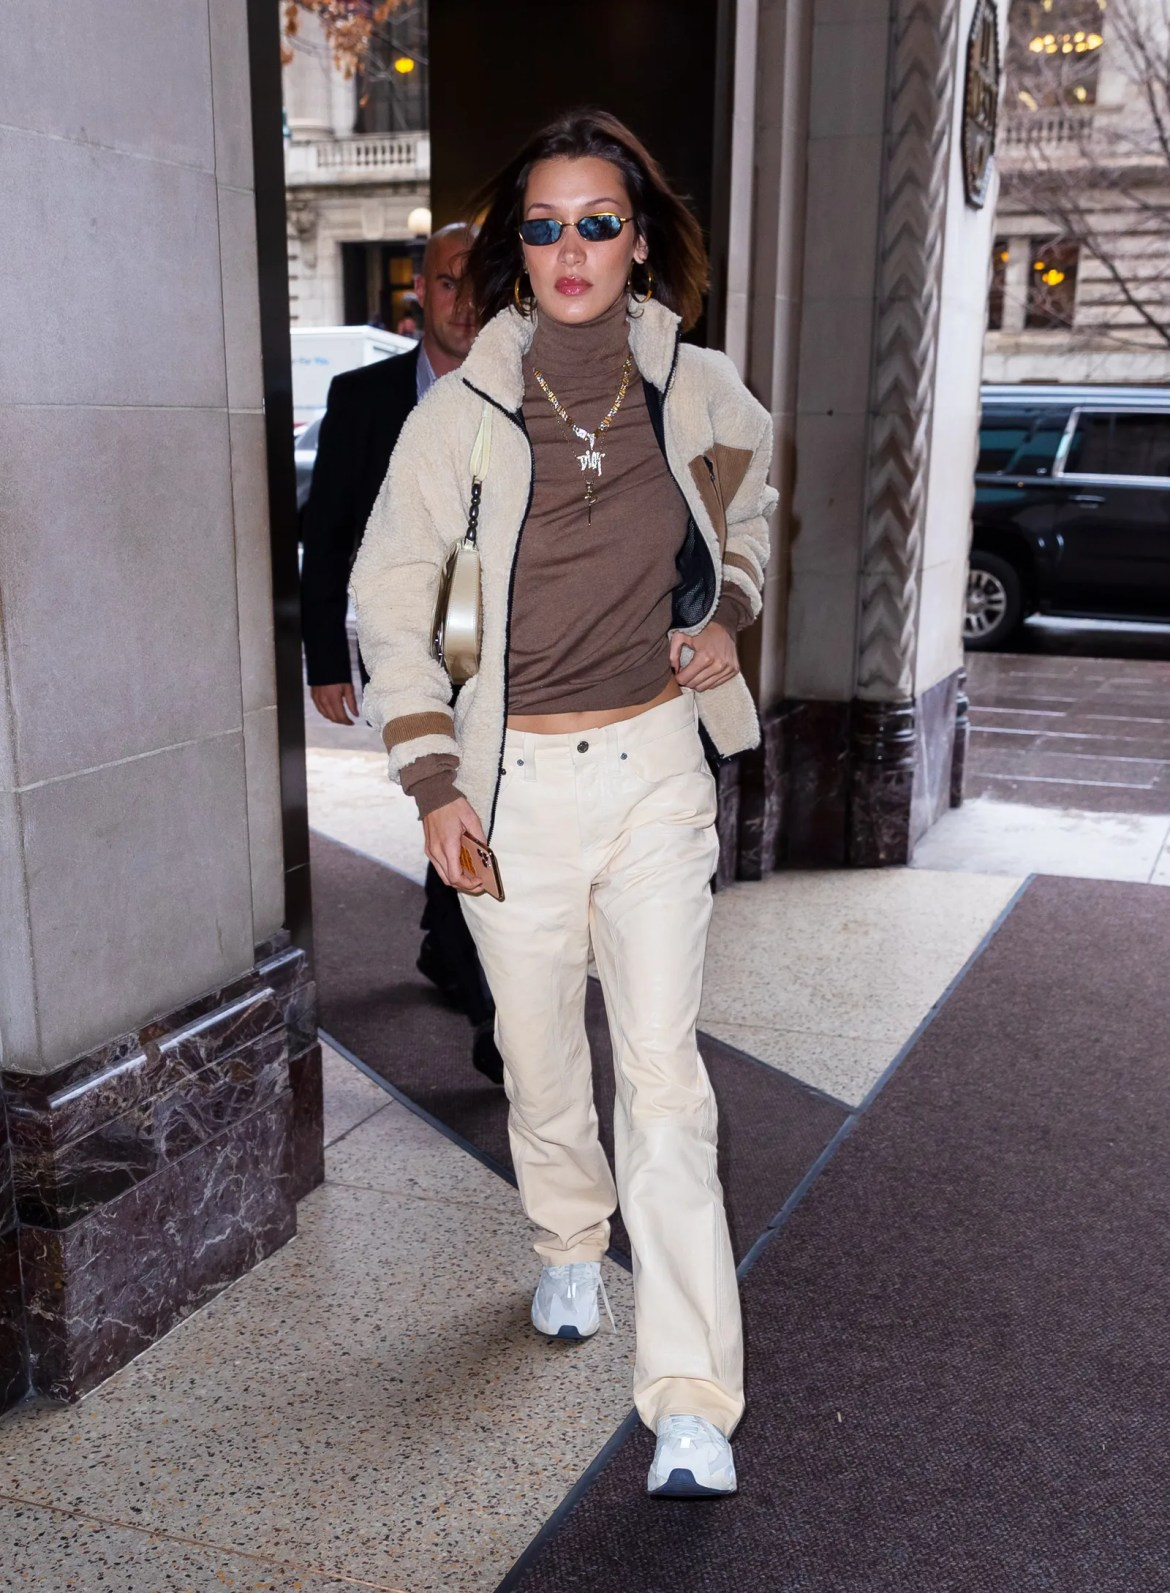 Kaia Gerber and Bella Hadid Sport a New Model OffDuty Jacket